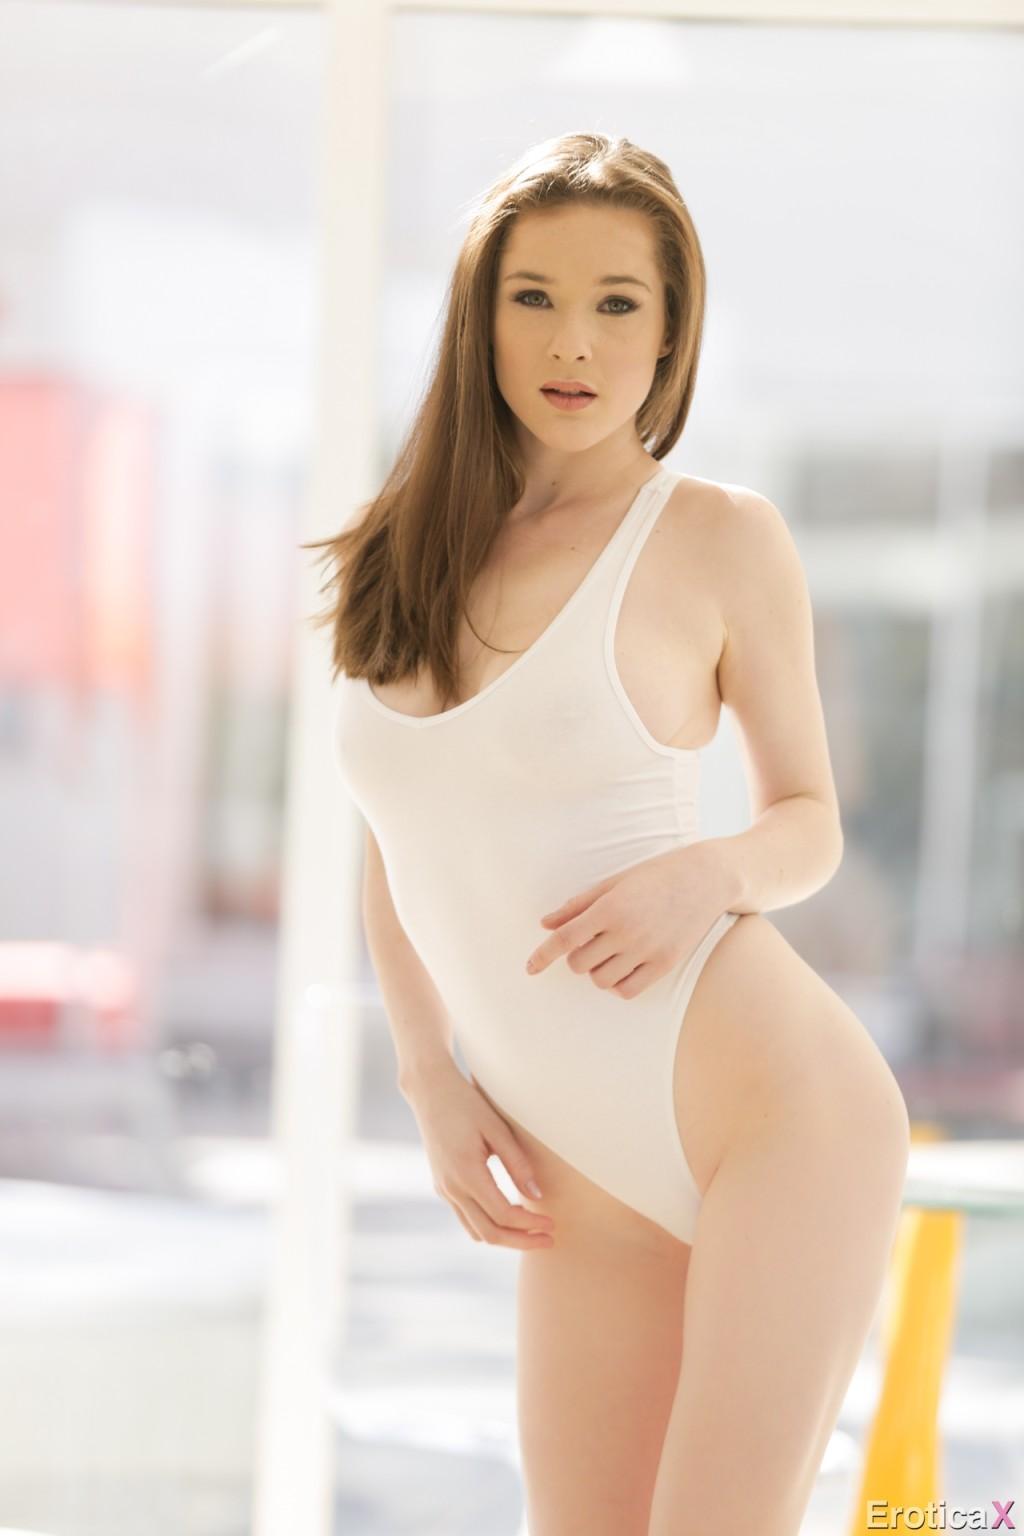 Porn star erotica